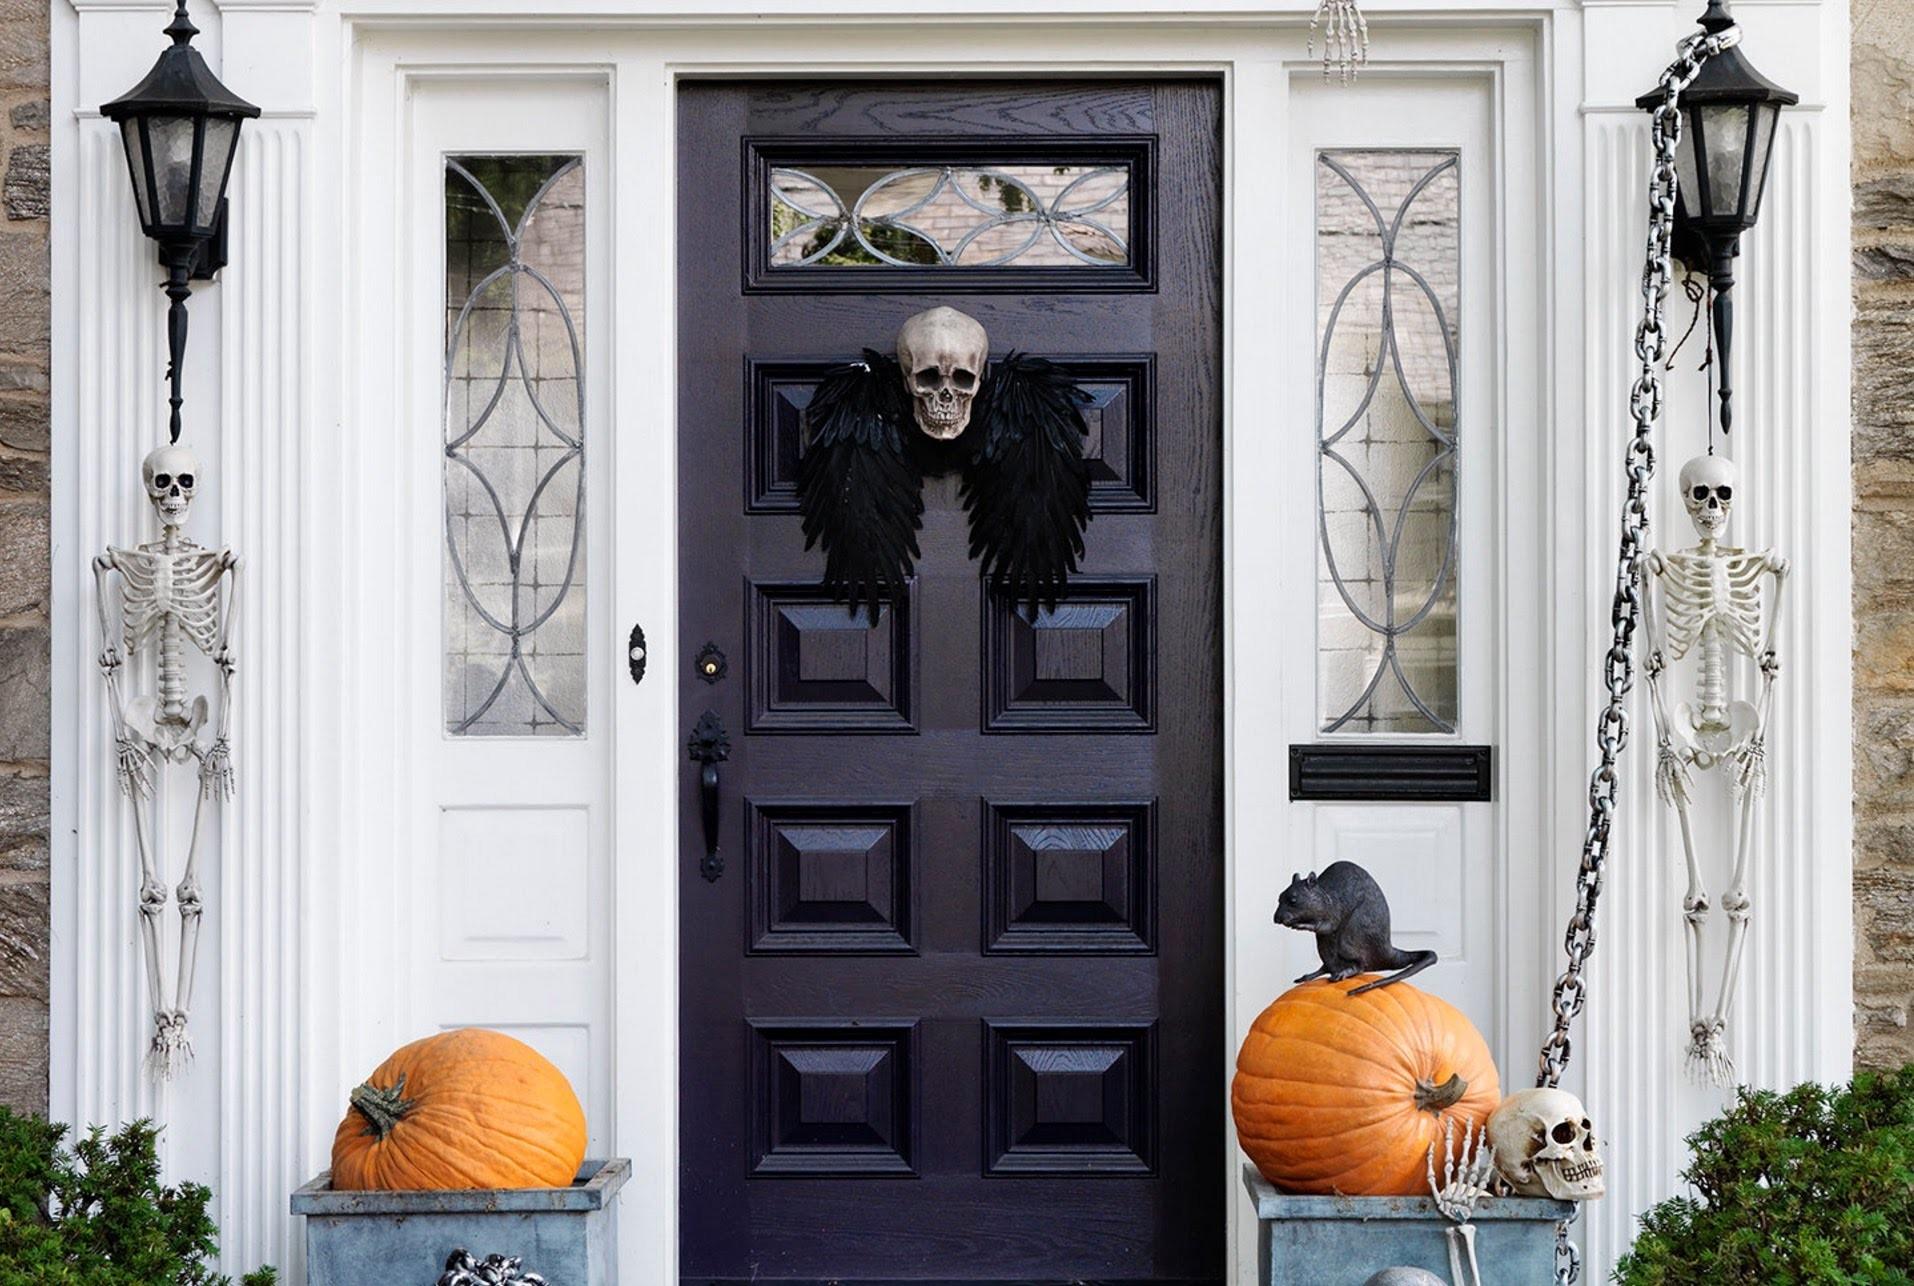 Spooky Halloween Decorations for Your Front Door | Real Simple